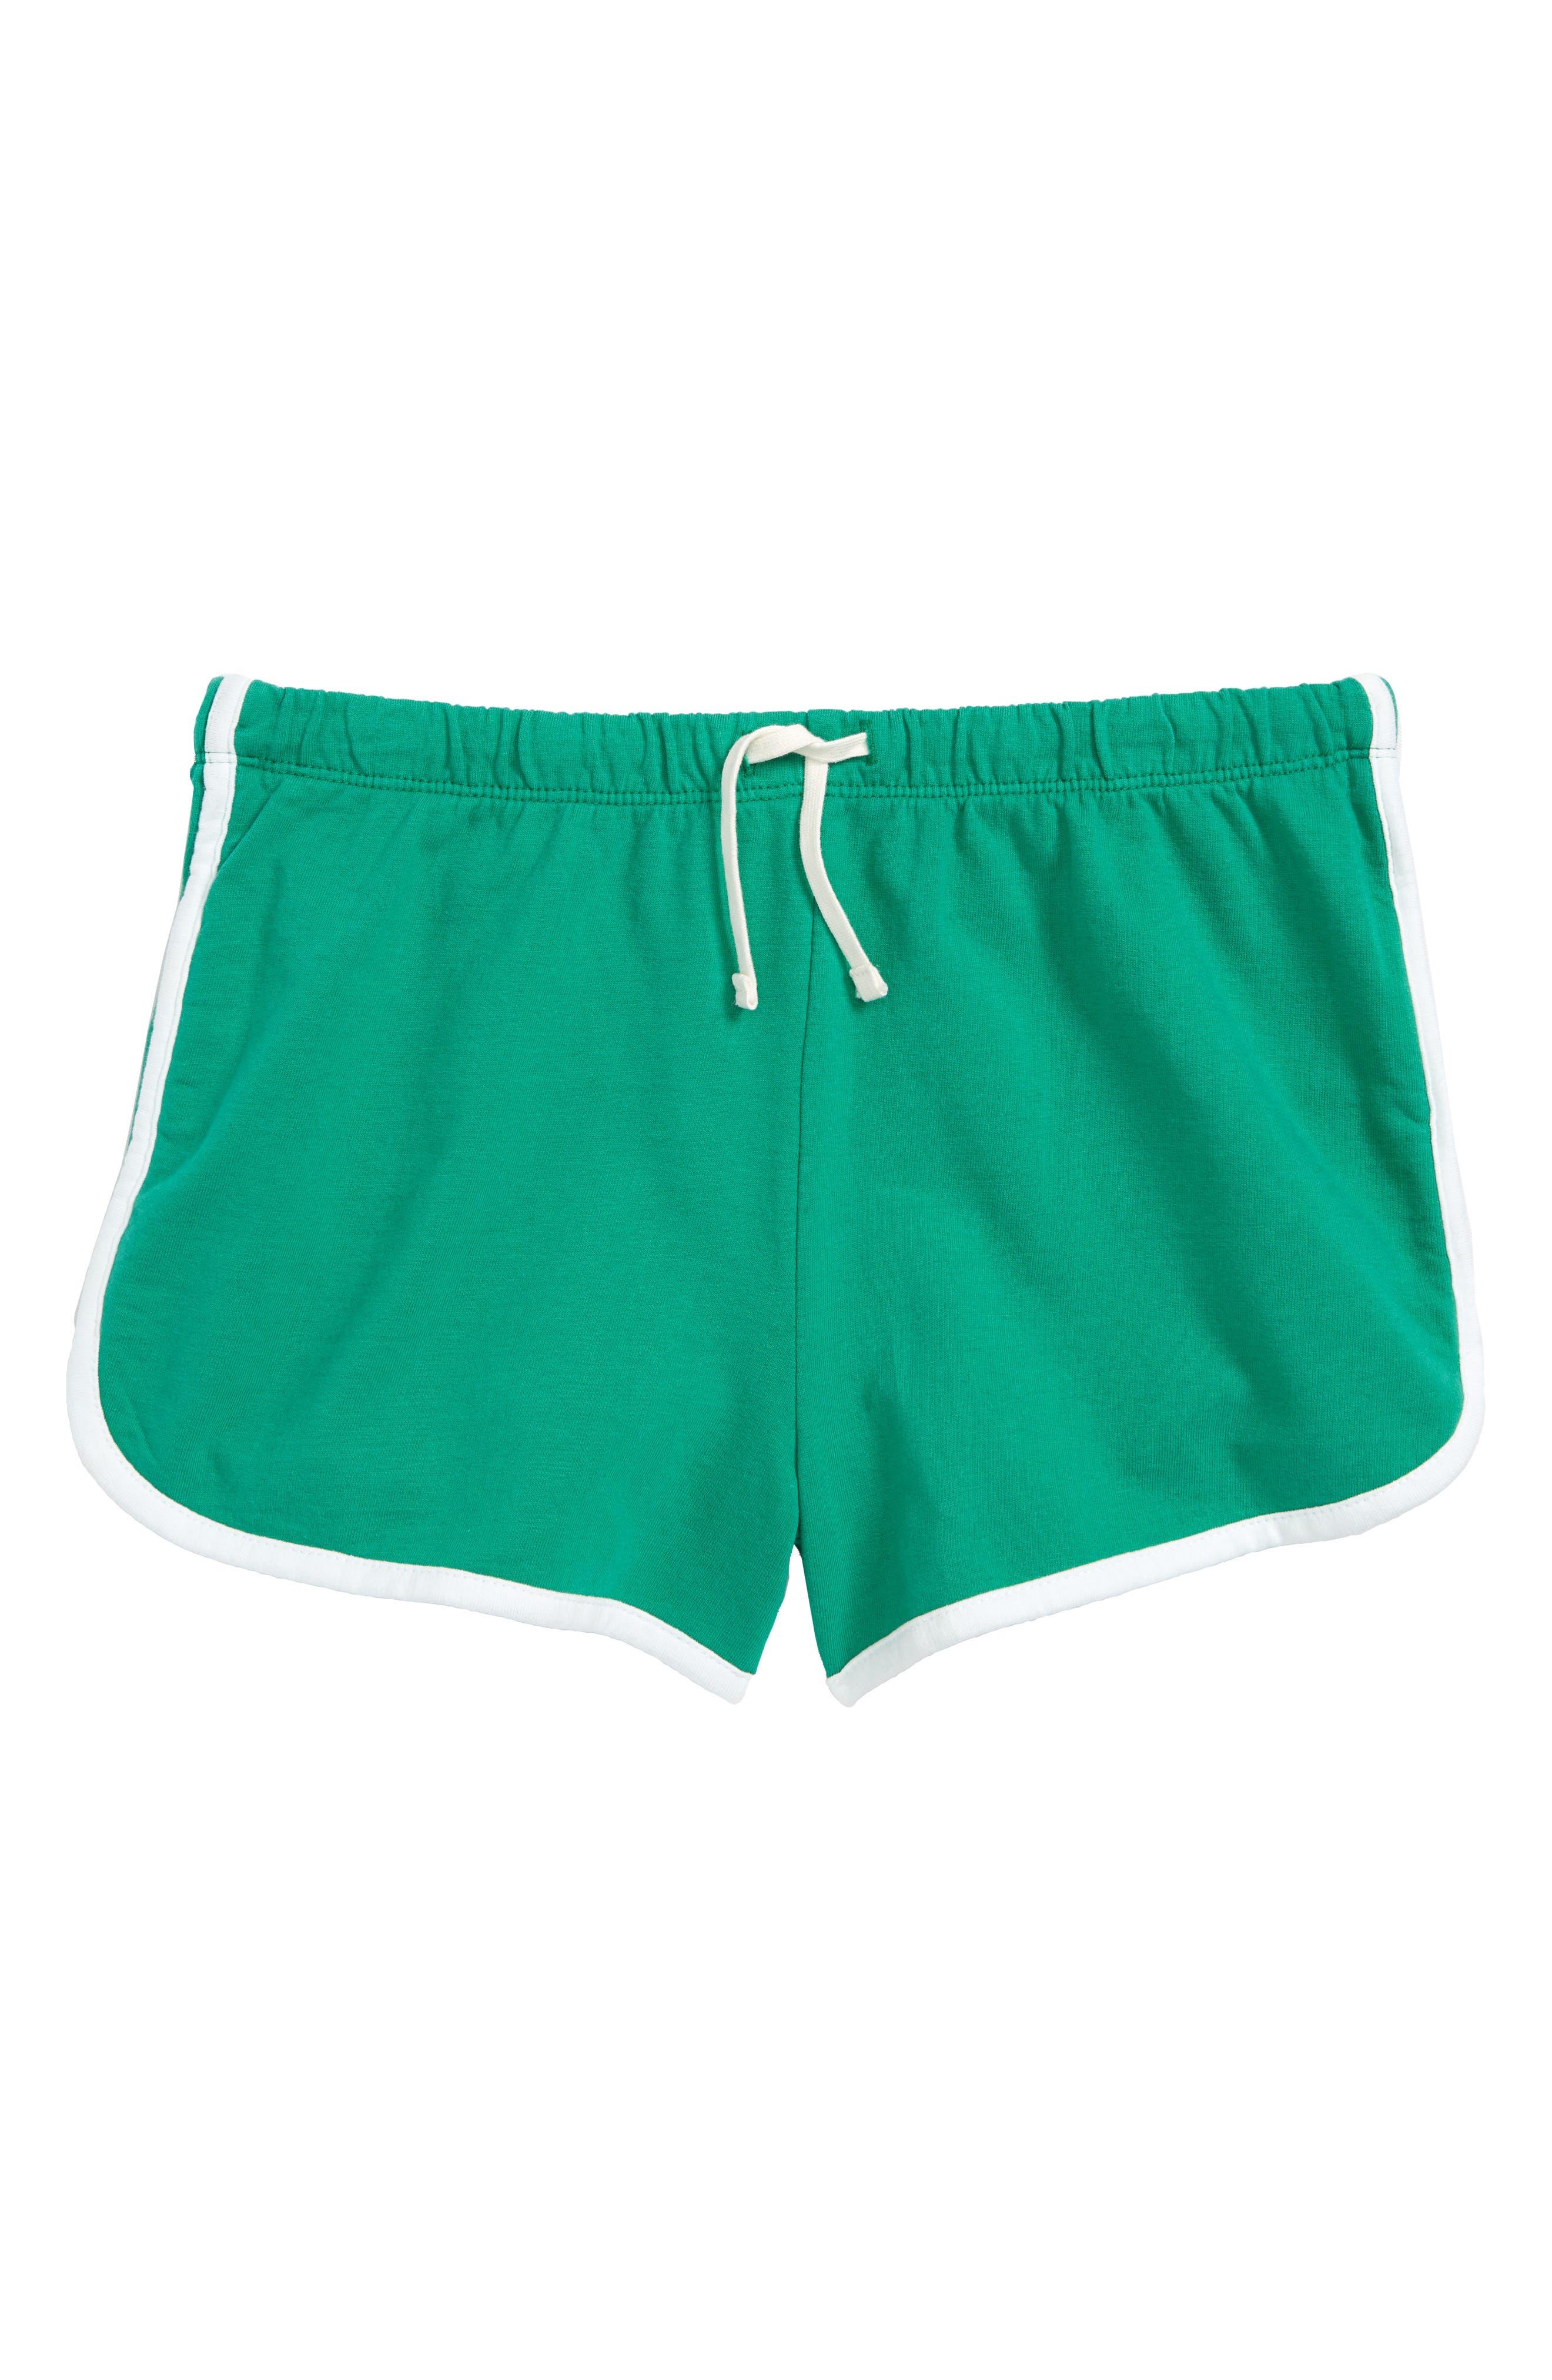 Cotton Dolphin Shorts,                             Main thumbnail 3, color,